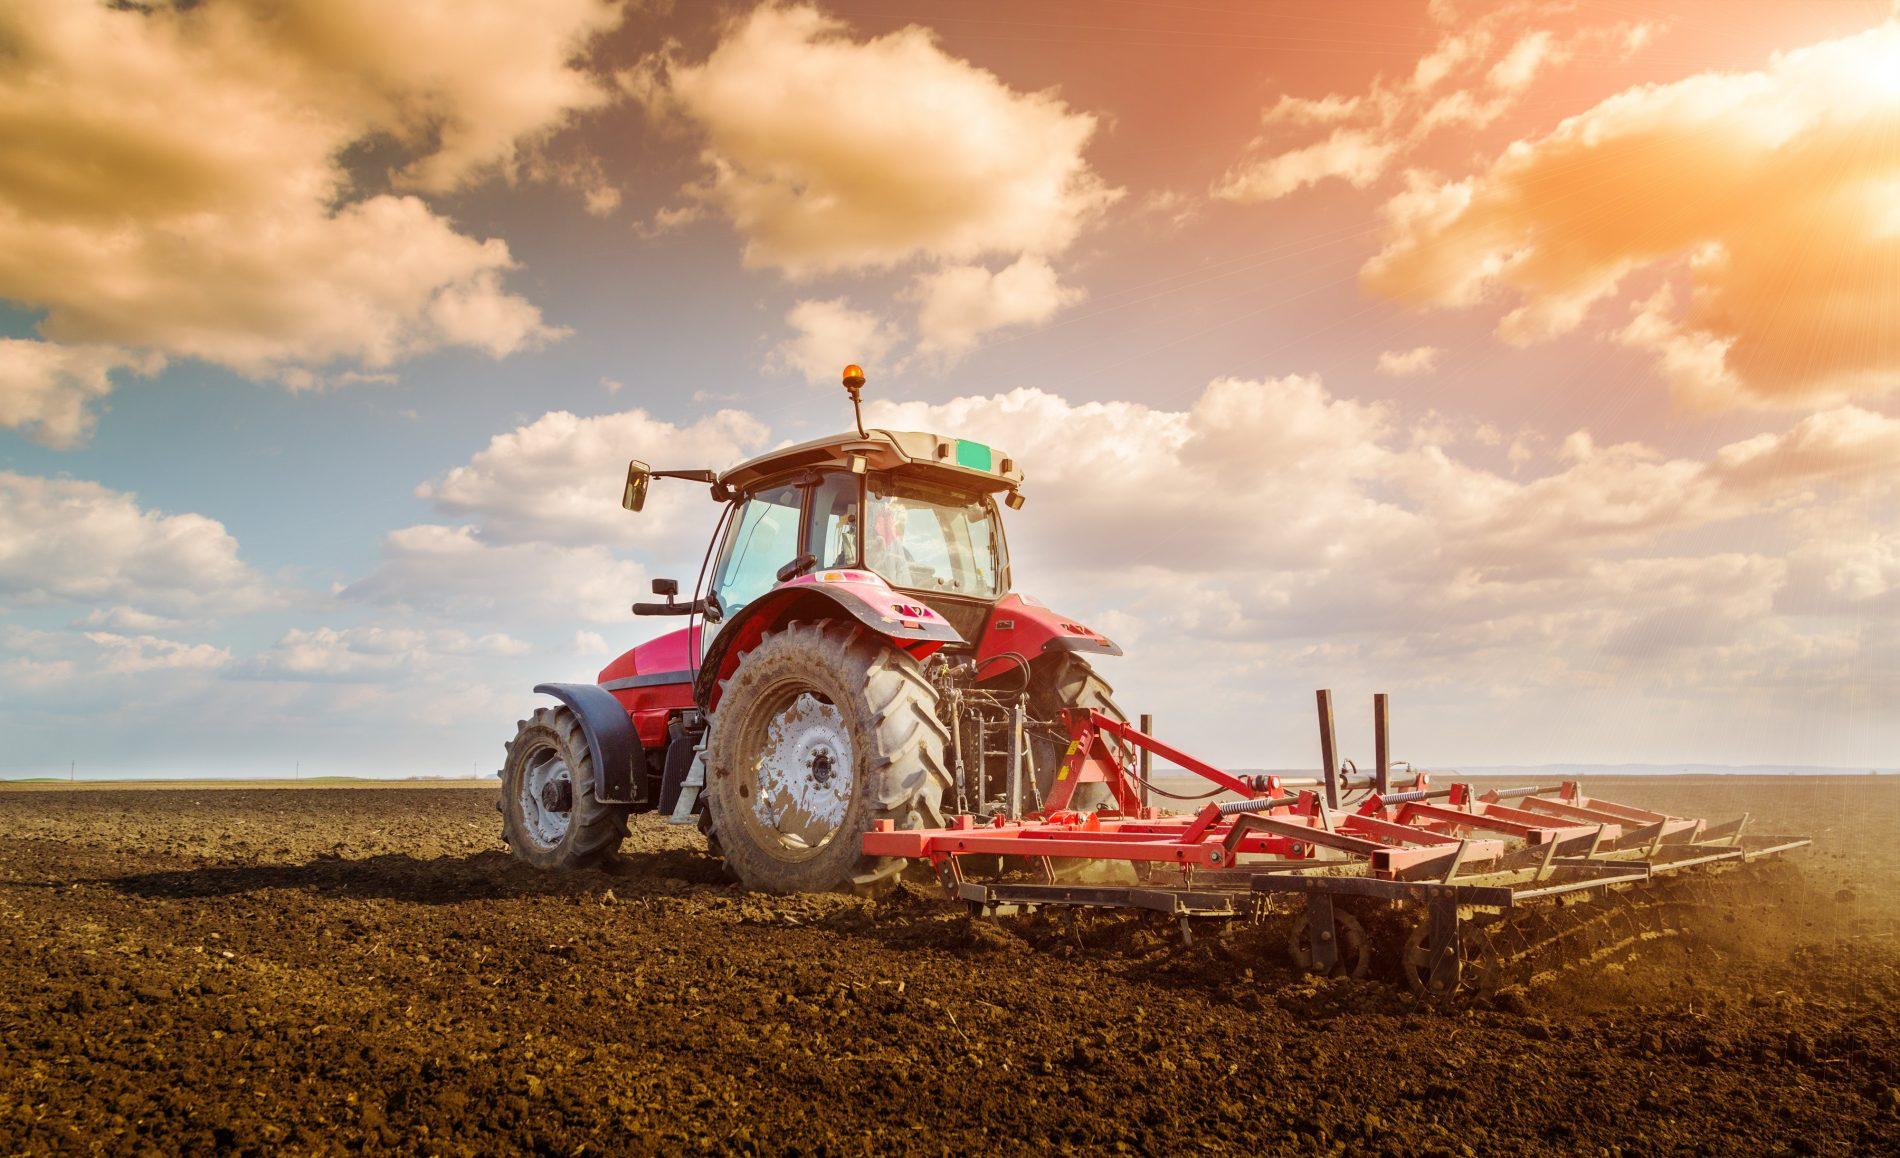 Producent Machine En Apparatenbouw Toelevering Agrarische Sector